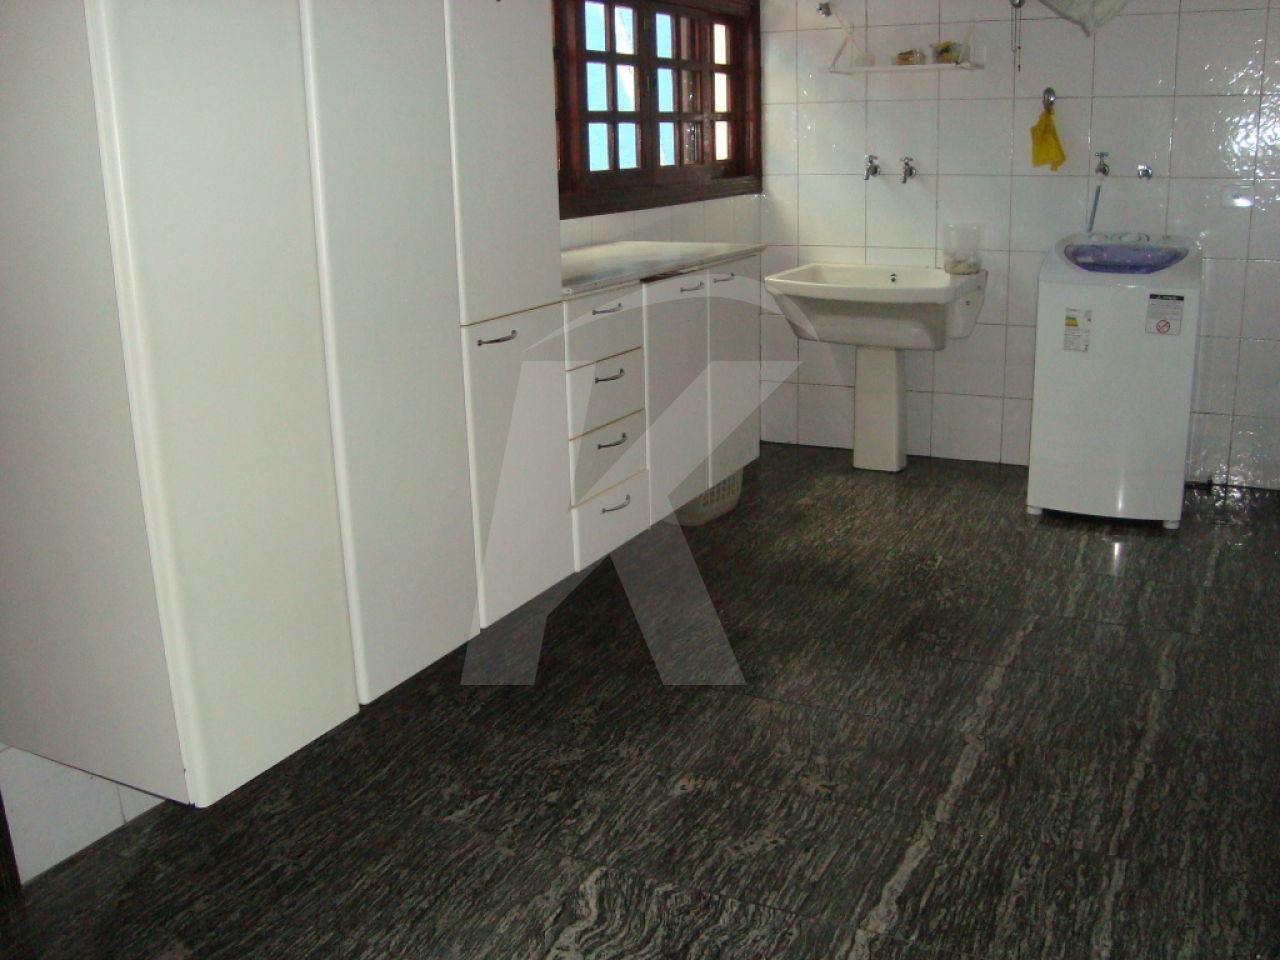 Sobrado Tremembé - 4 Dormitório(s) - São Paulo - SP - REF. KA3980